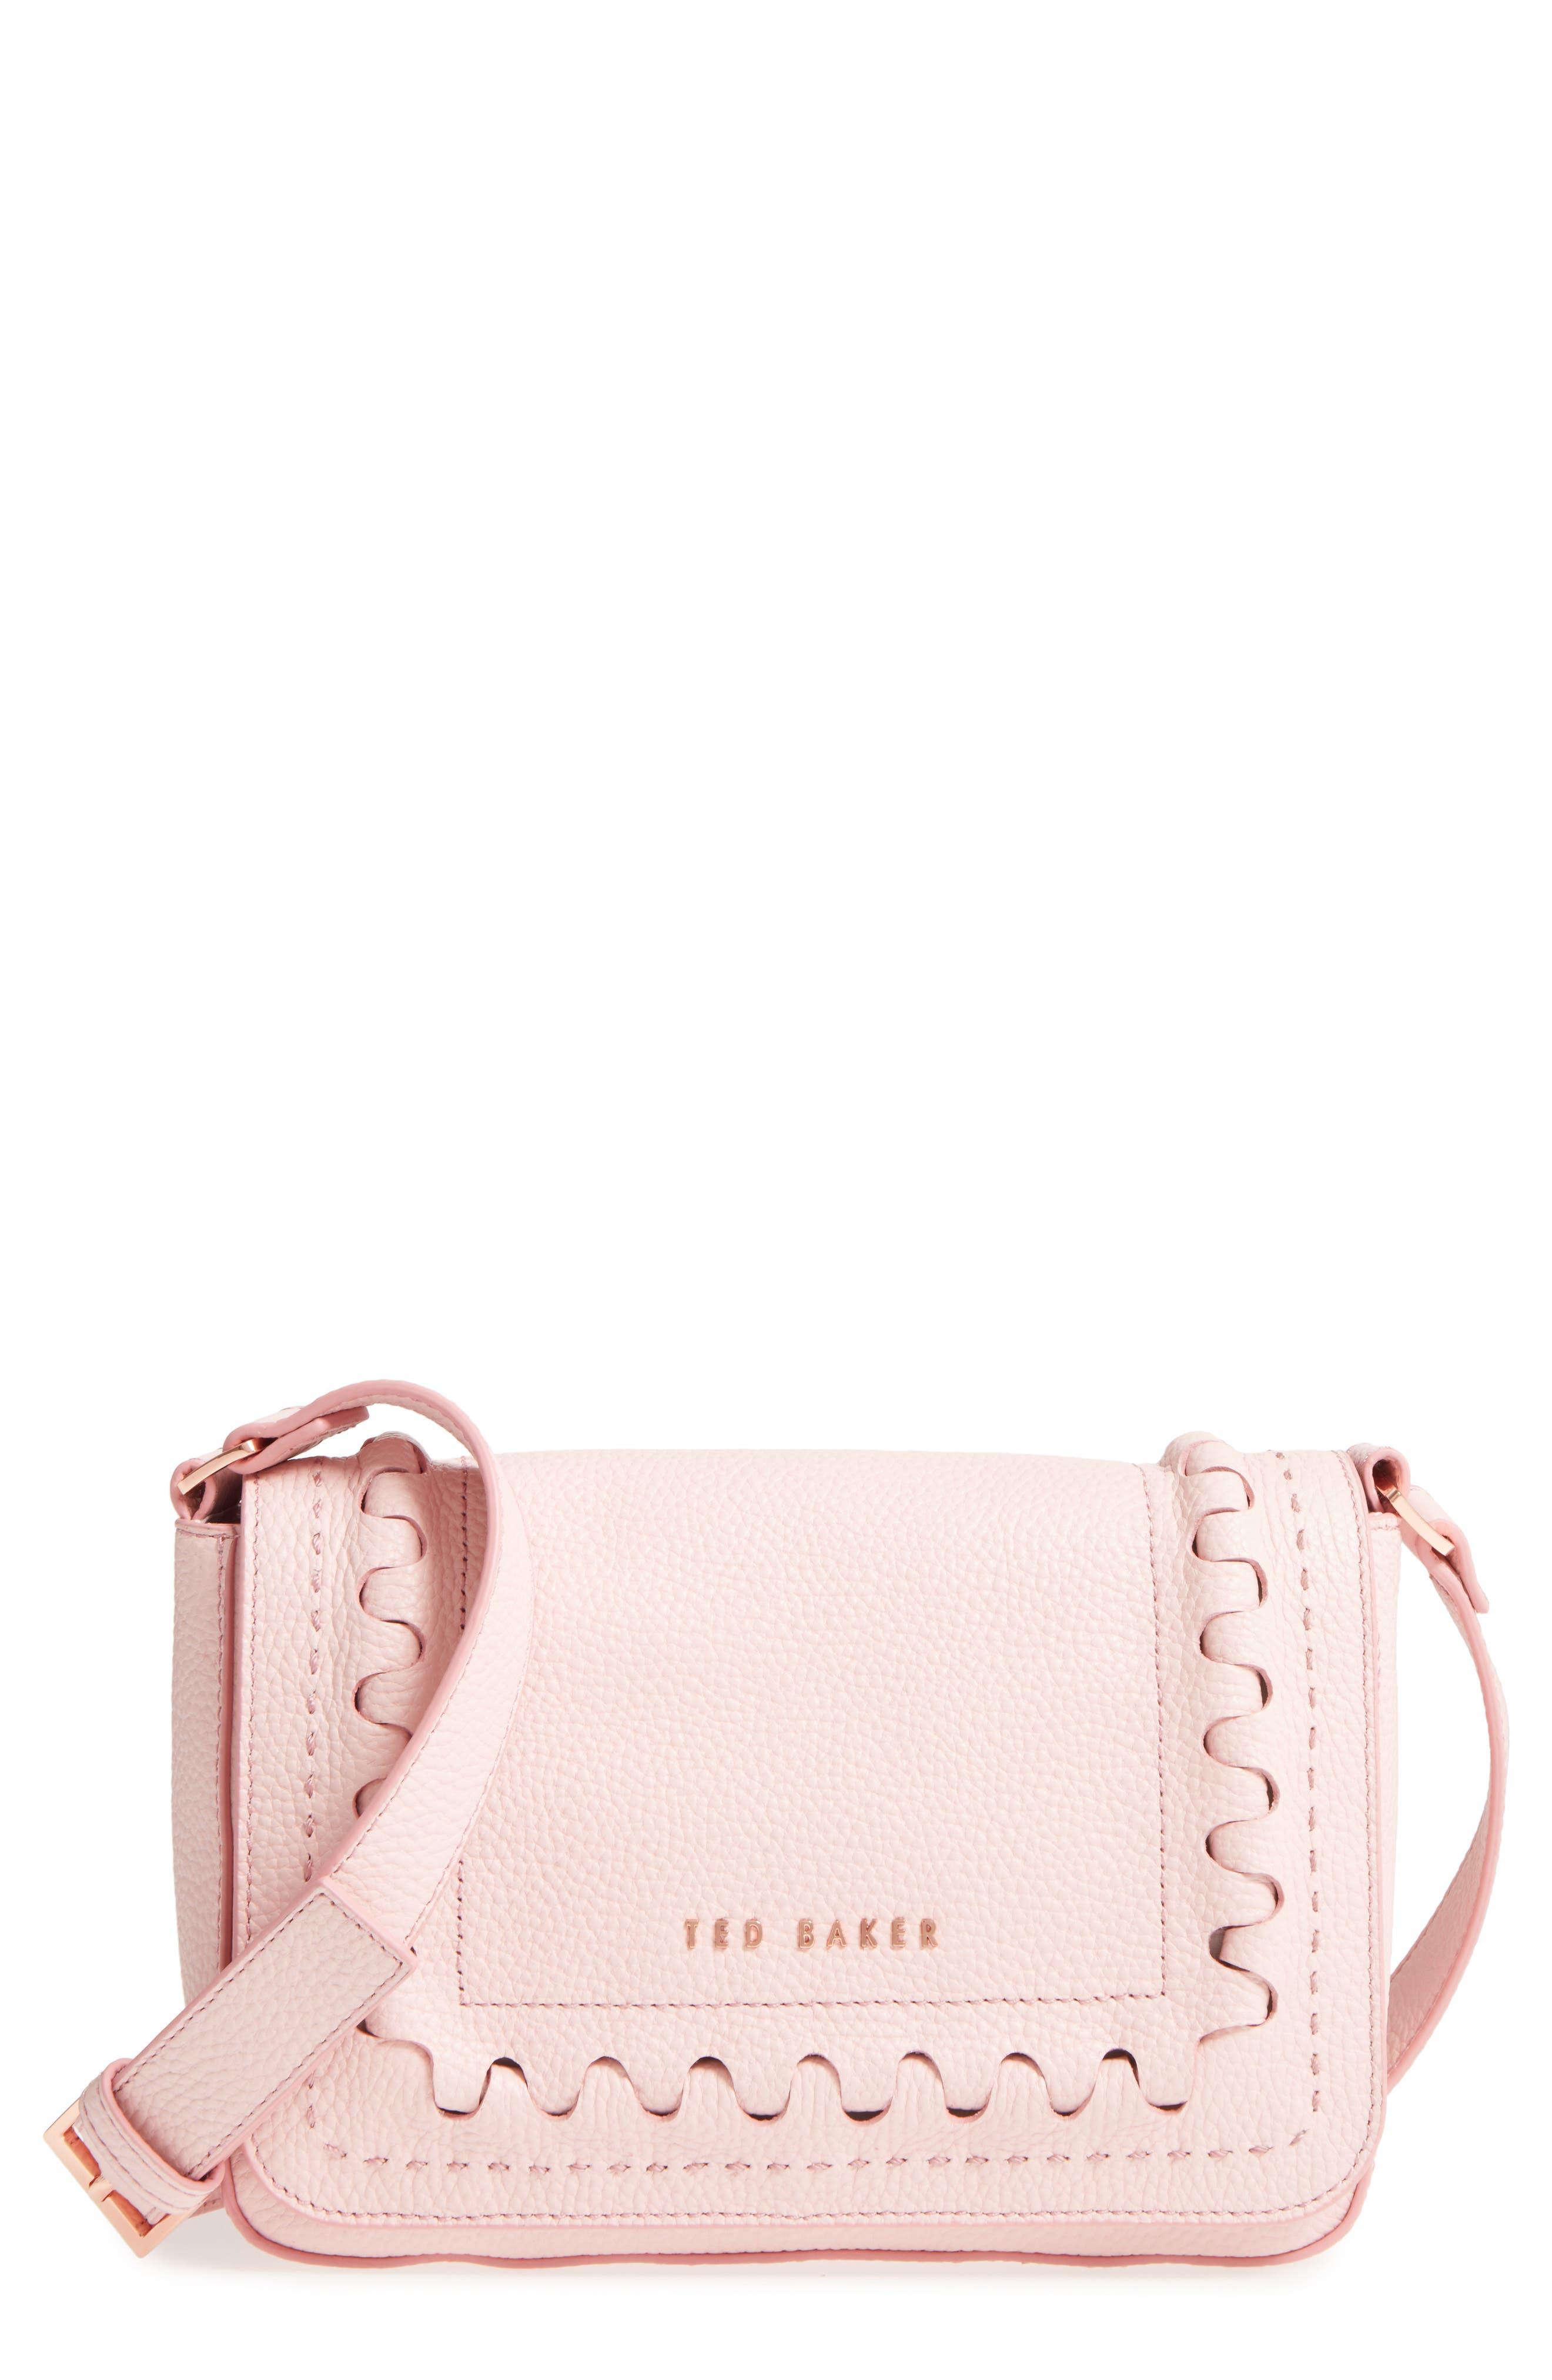 Tippi Leather Crossbody Bag,                             Main thumbnail 3, color,